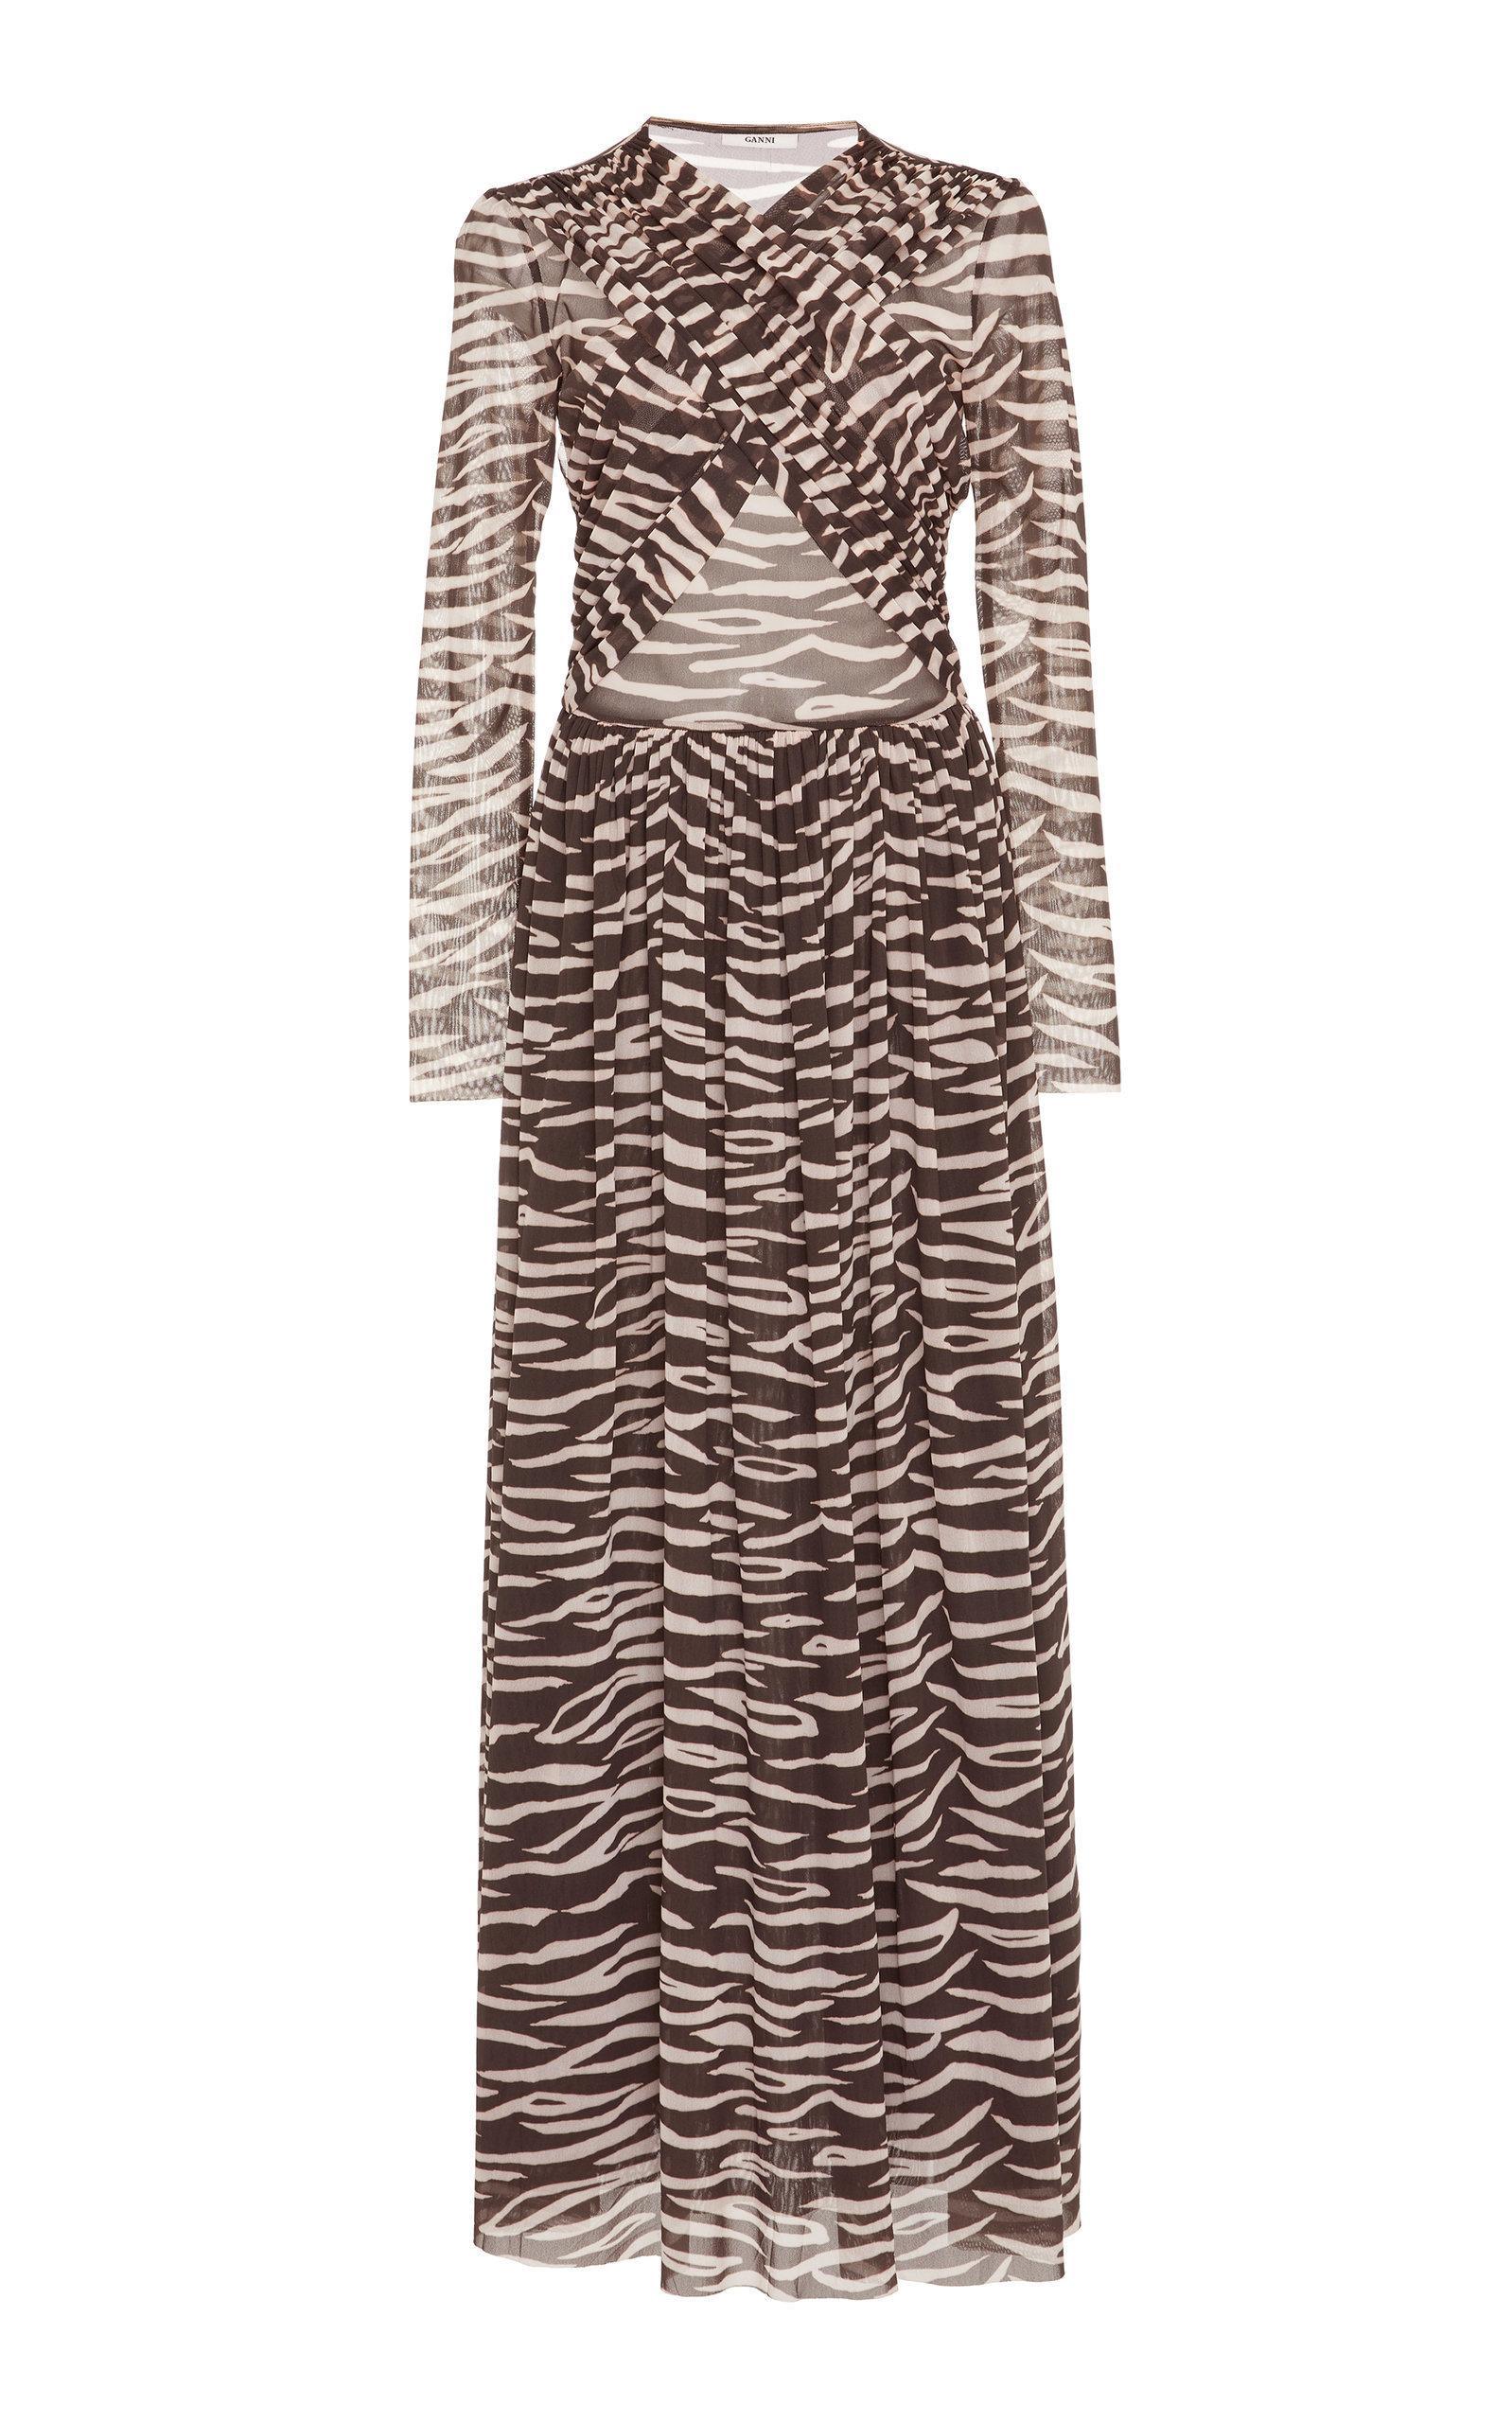 44468f07748 Ganni Tilden Zebra-Print Mesh Maxi Dress In Animal